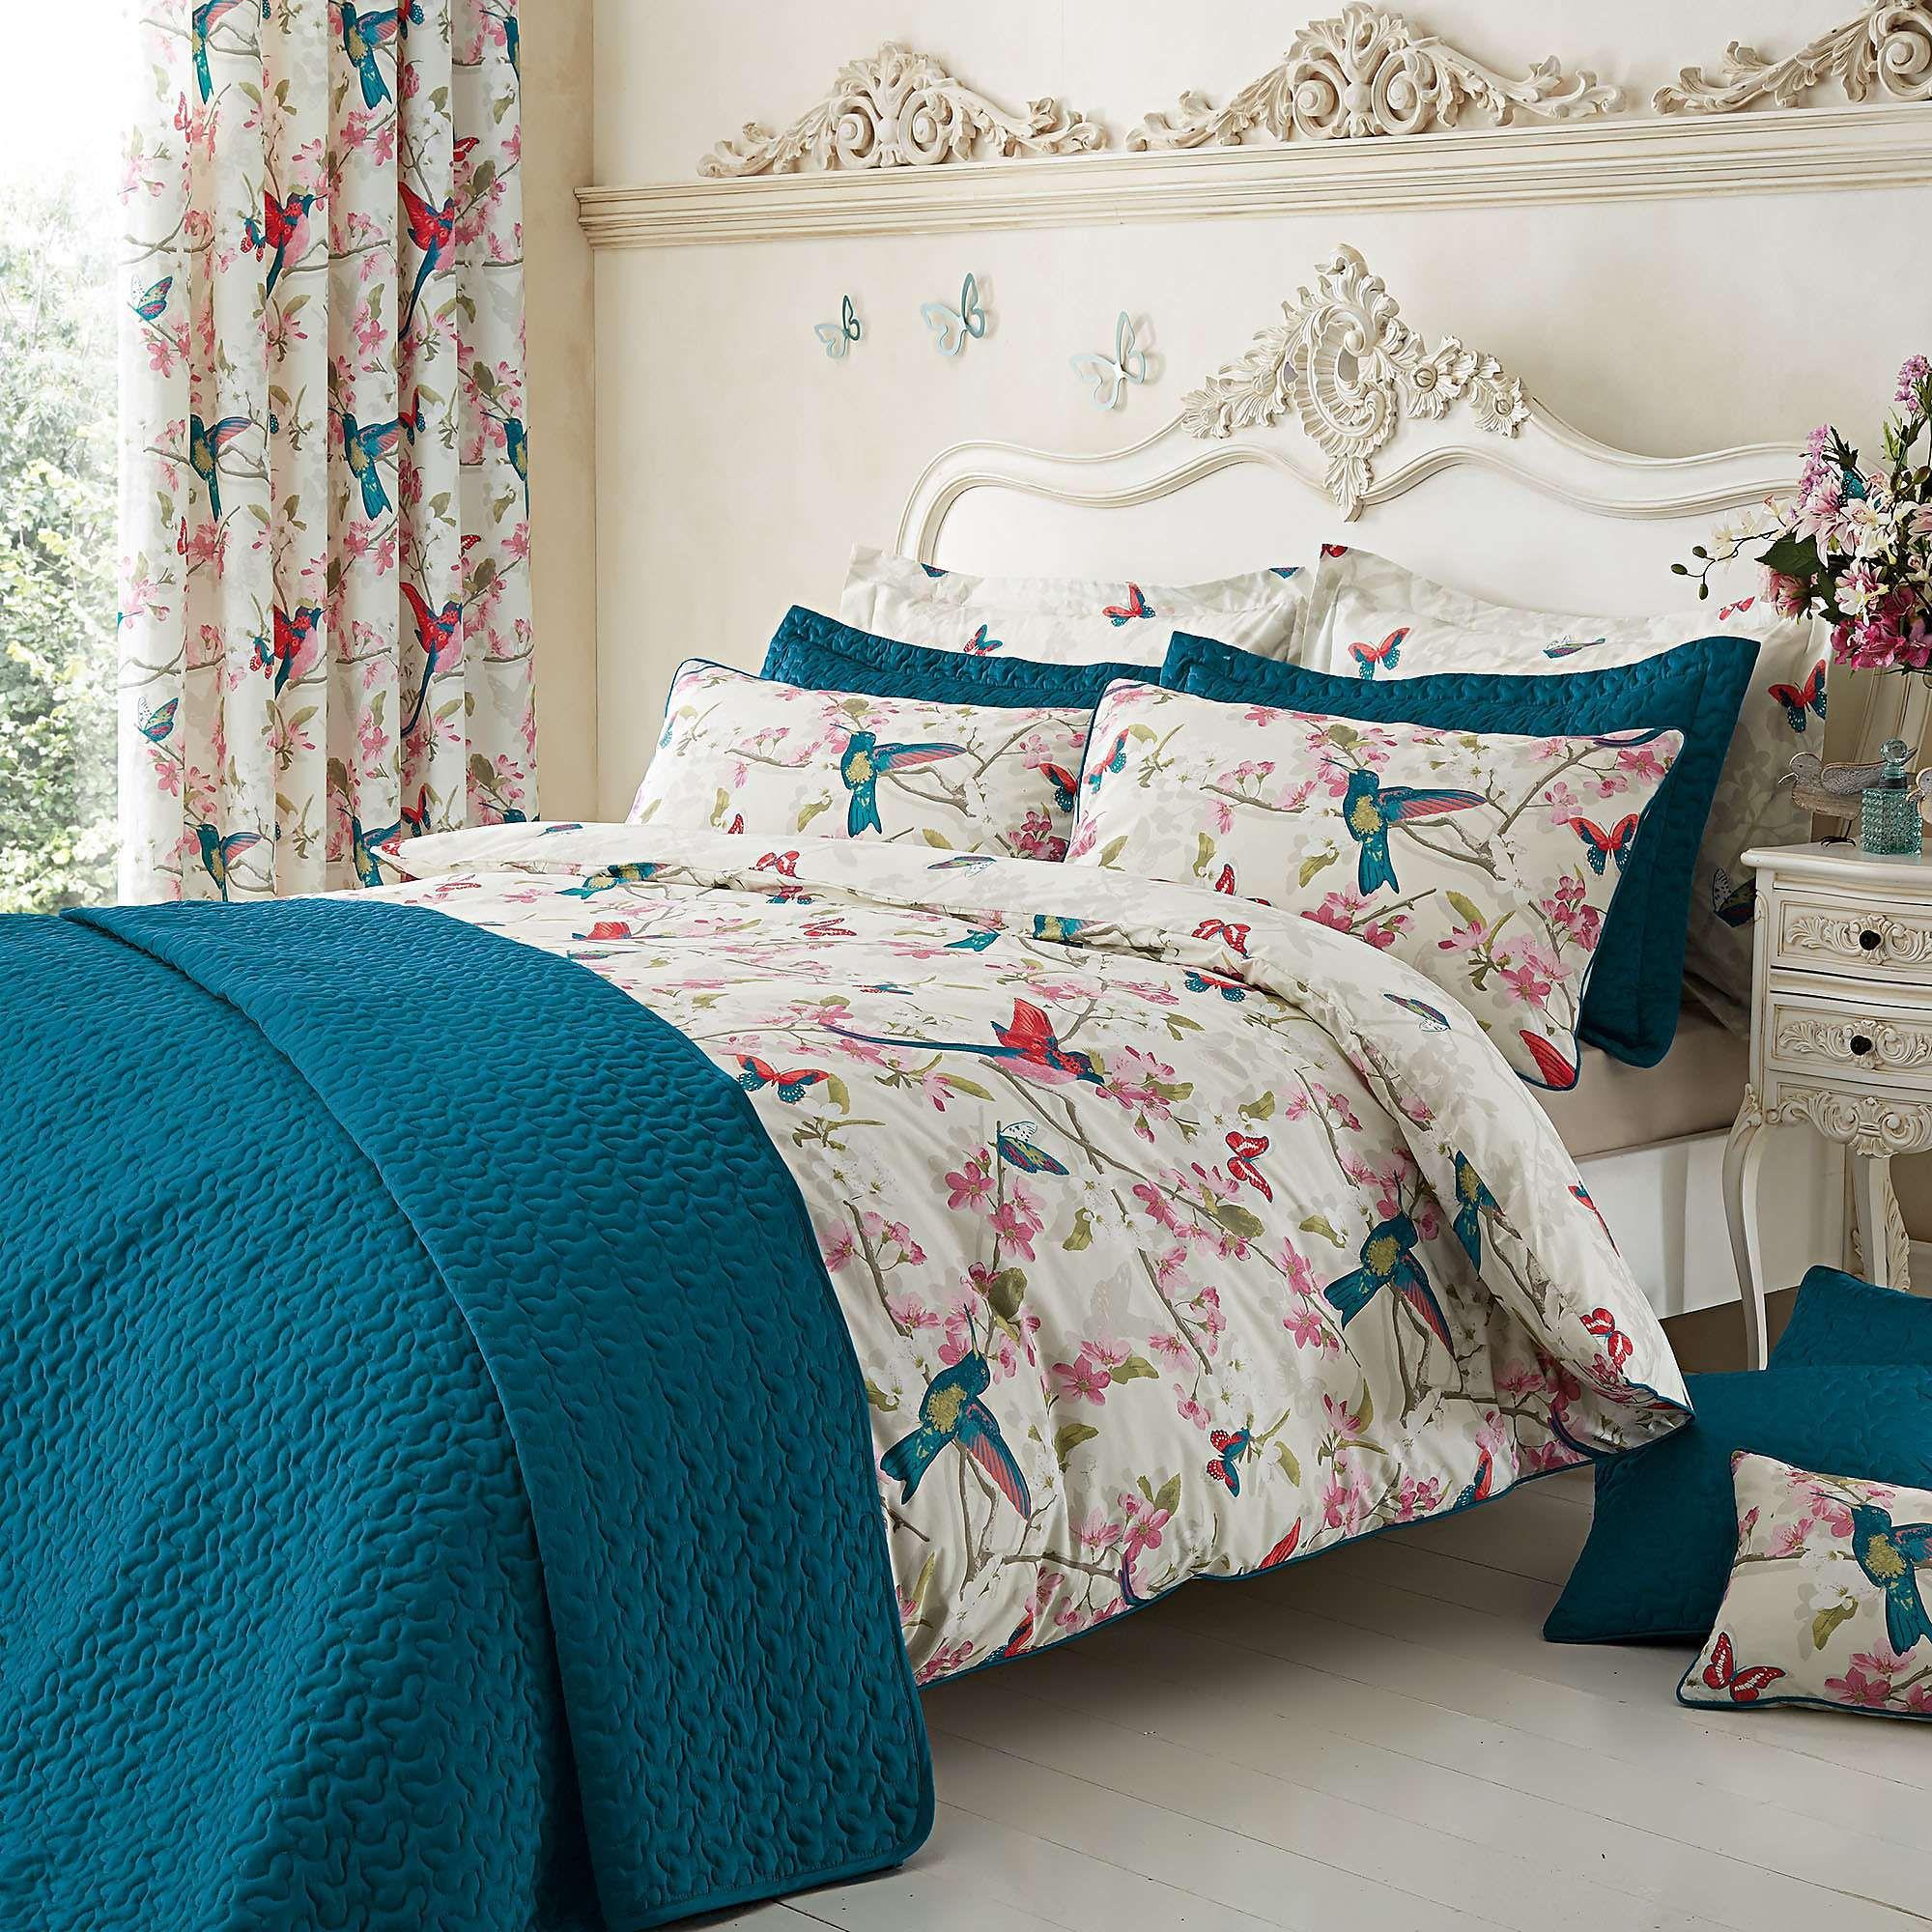 Teal Tropical Birds Bed Linen Collection Dunelm Bedrooms